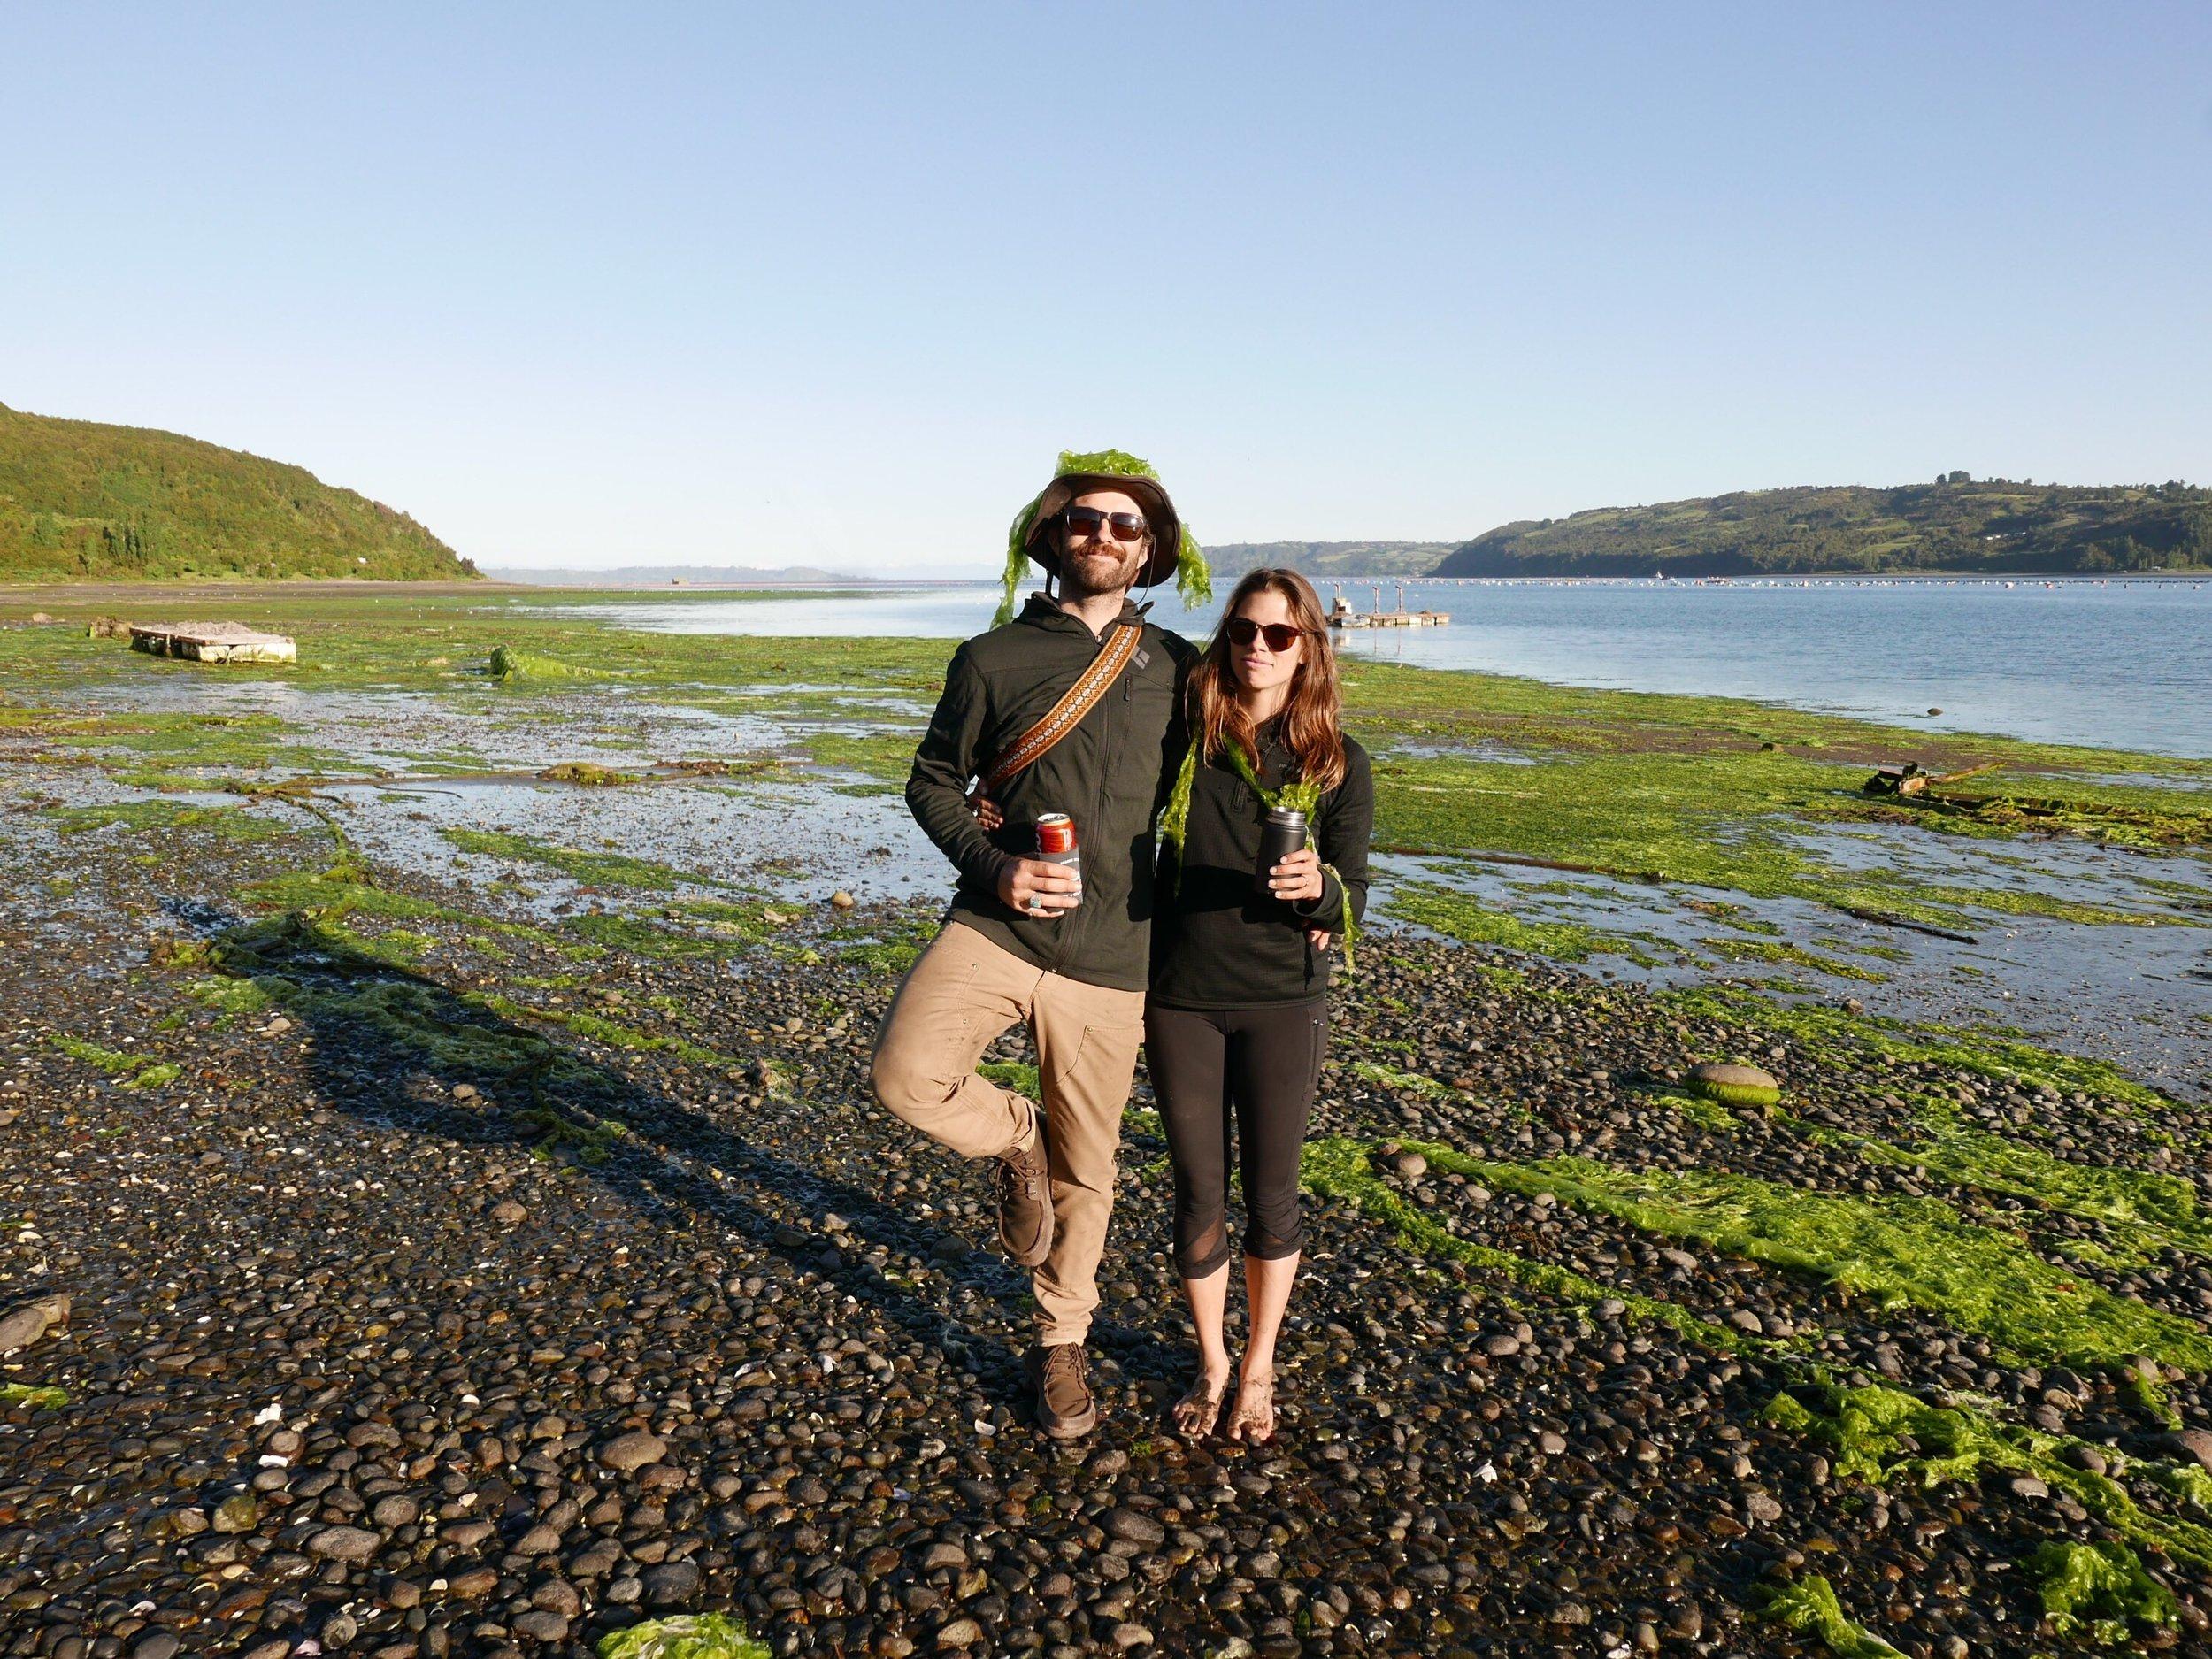 Mele kalikimaka. Our susperstar visitors—Sam and Bina.